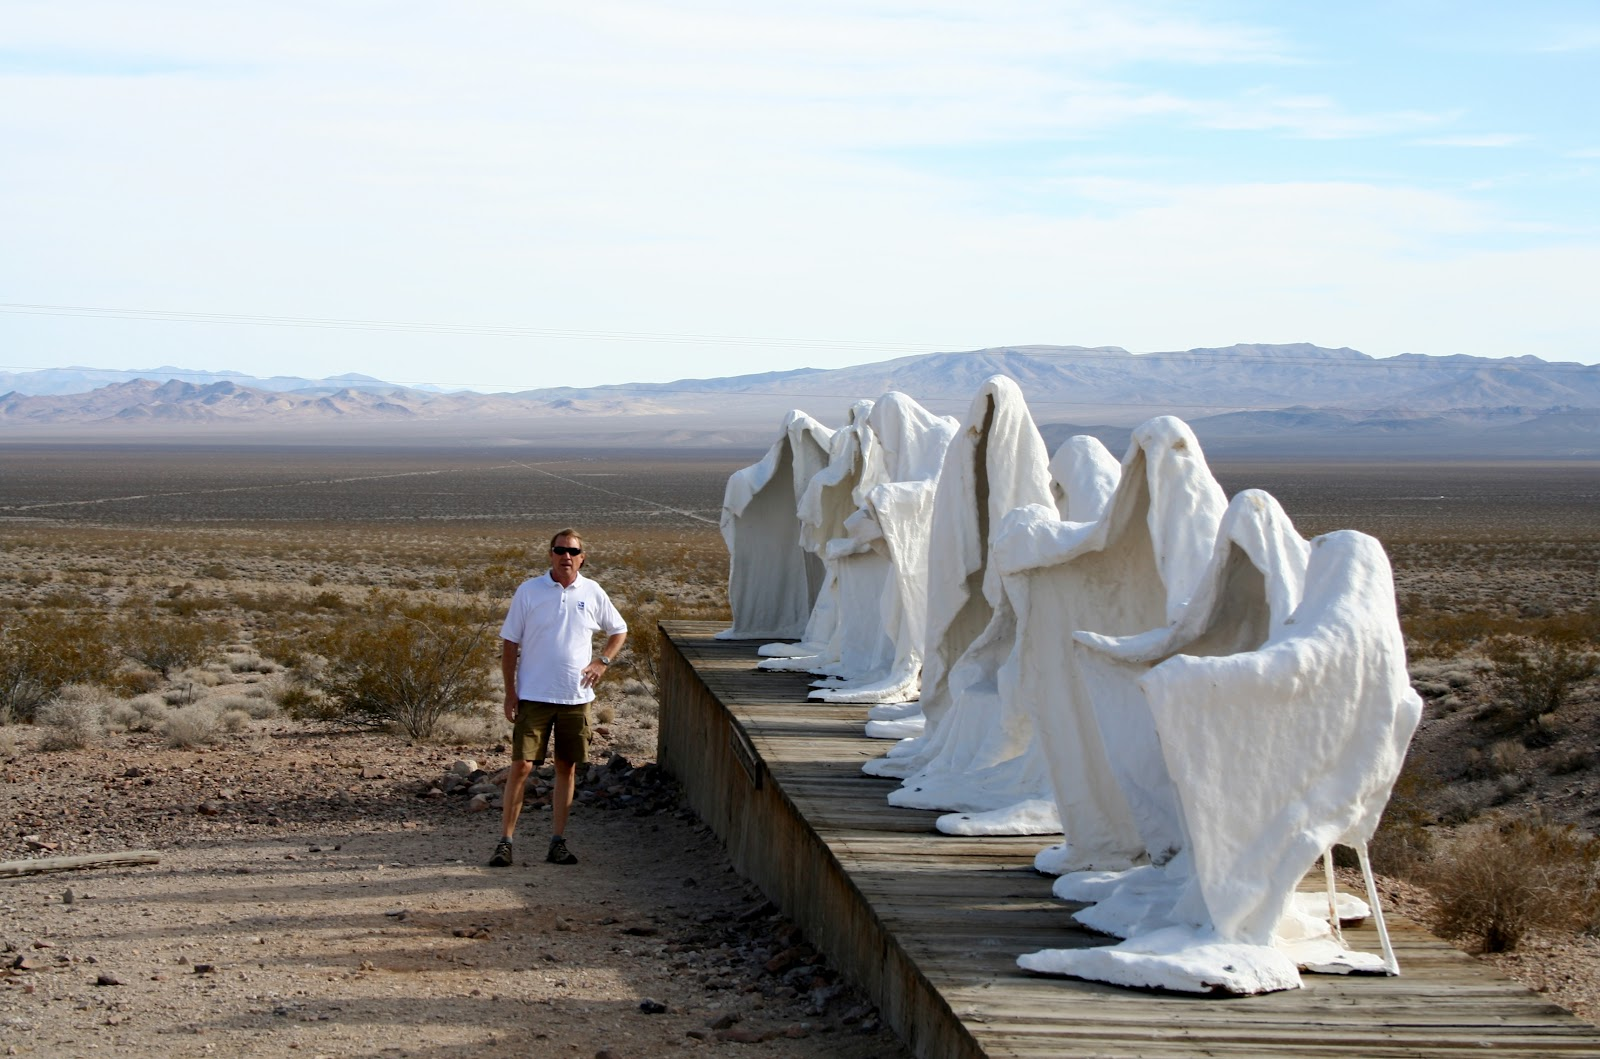 Joe, Diane, & Mallerys Big Adventure - Modern Day Gypsies: Rhyolite, Nevada